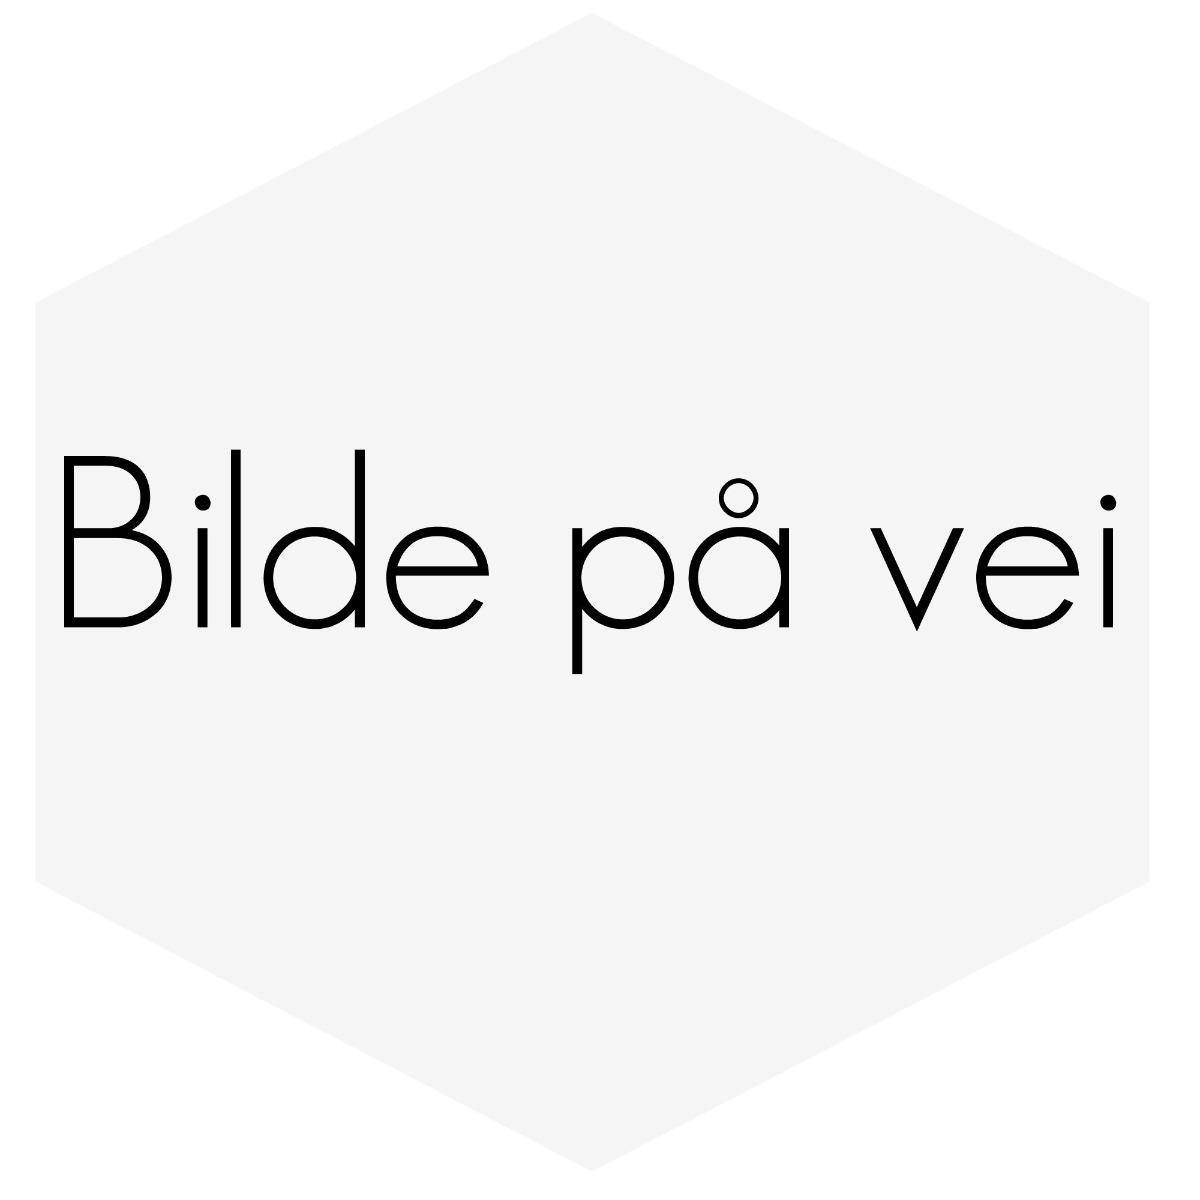 "SILIKONSLANGE RØD REDUSERING 2-2,25"" (51-57MM)"